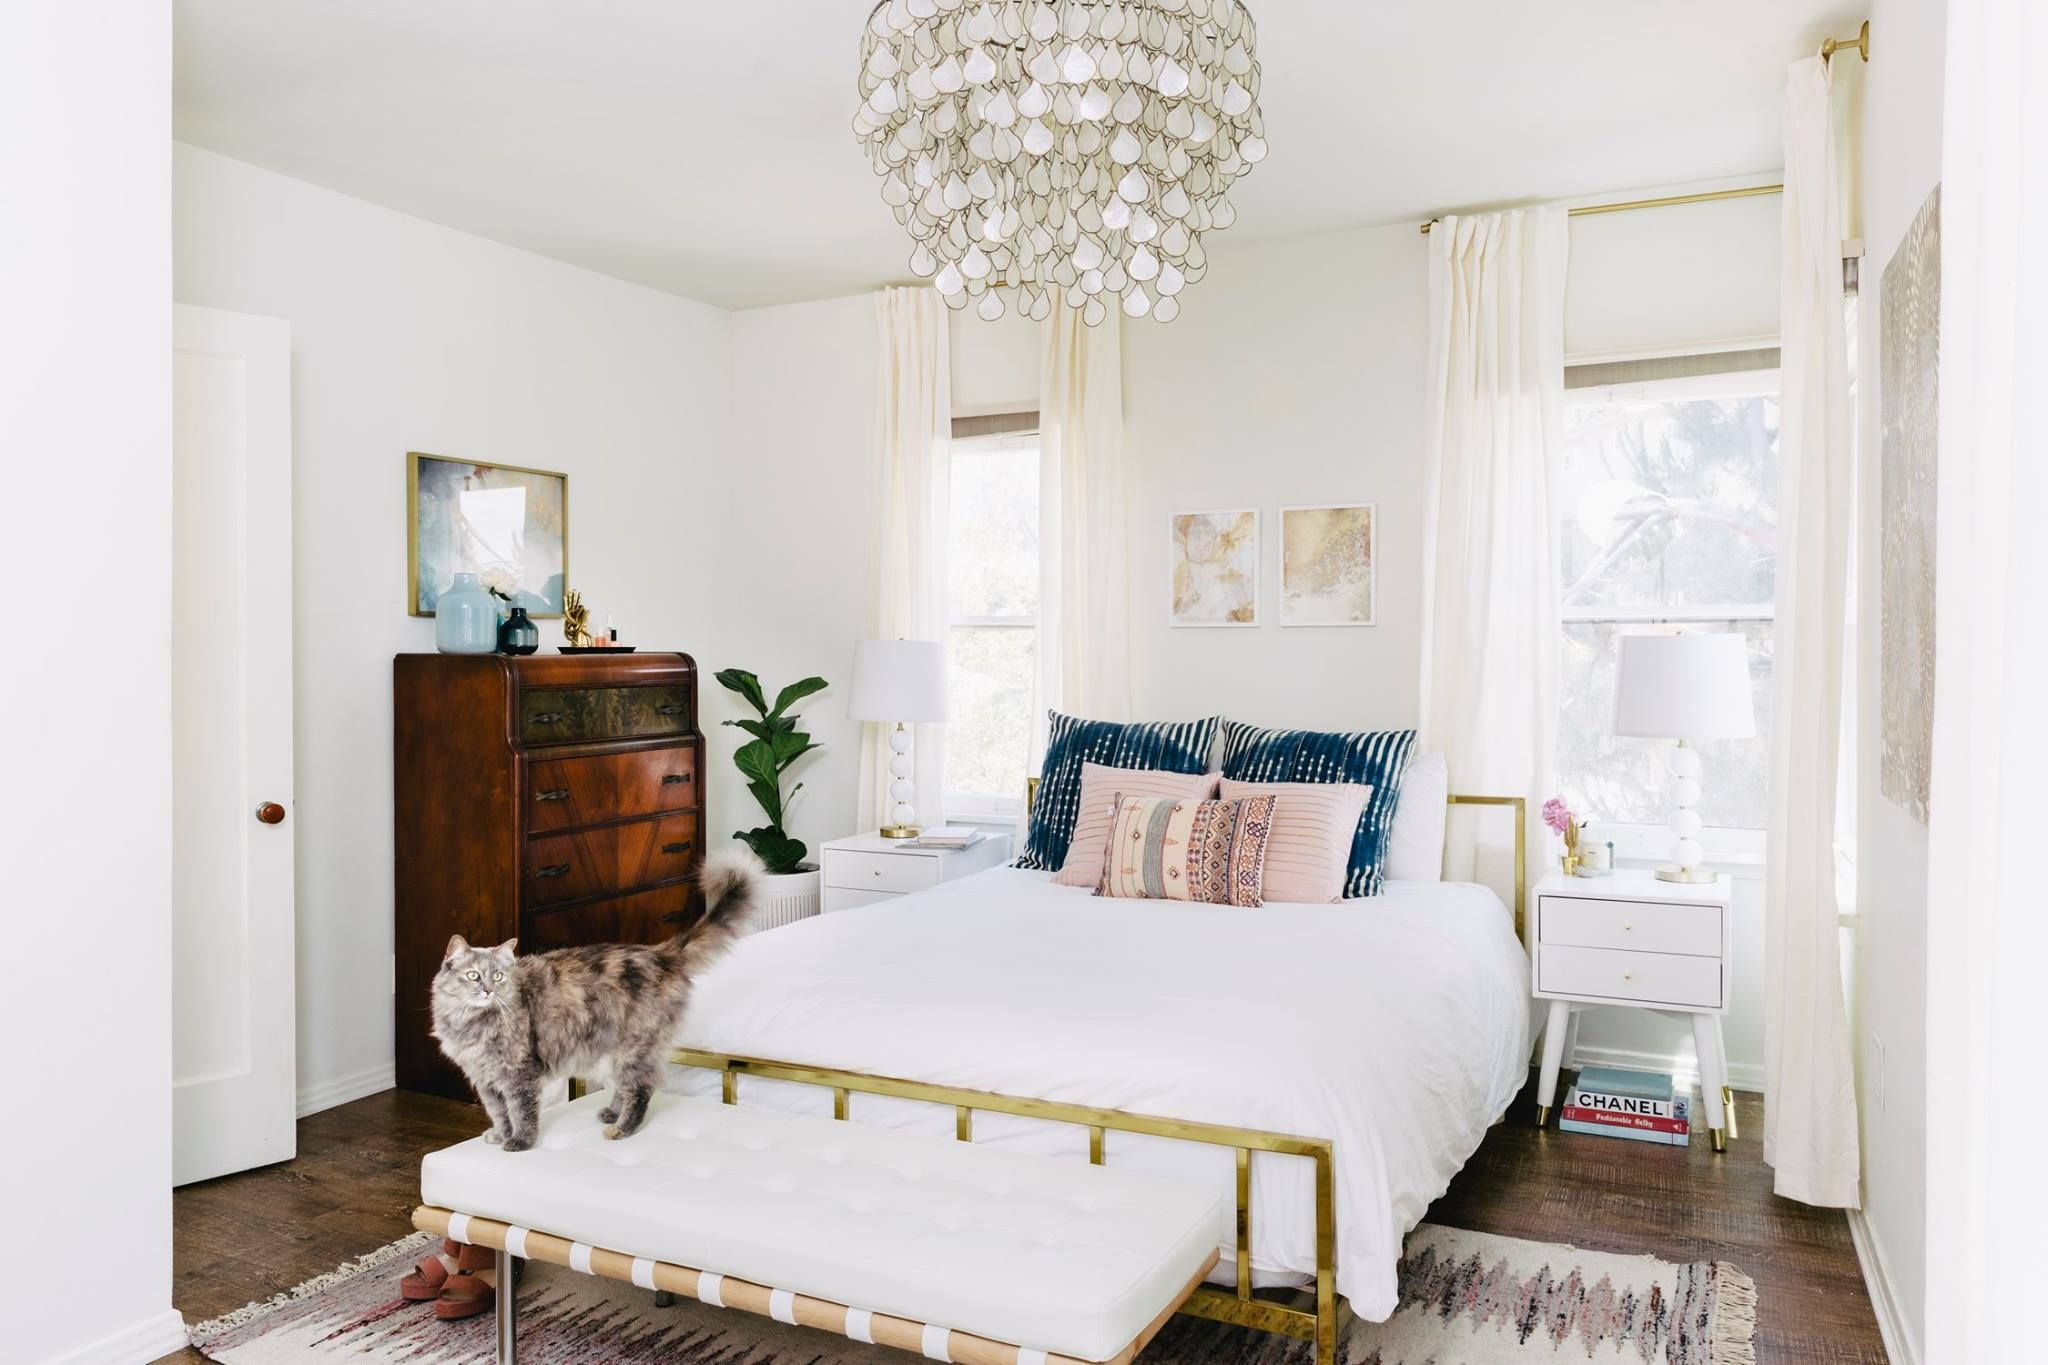 Jordan Interiors Home Decor Luxurious Bedrooms Modern Feminine Bedroom Boho glam bedroom ideas